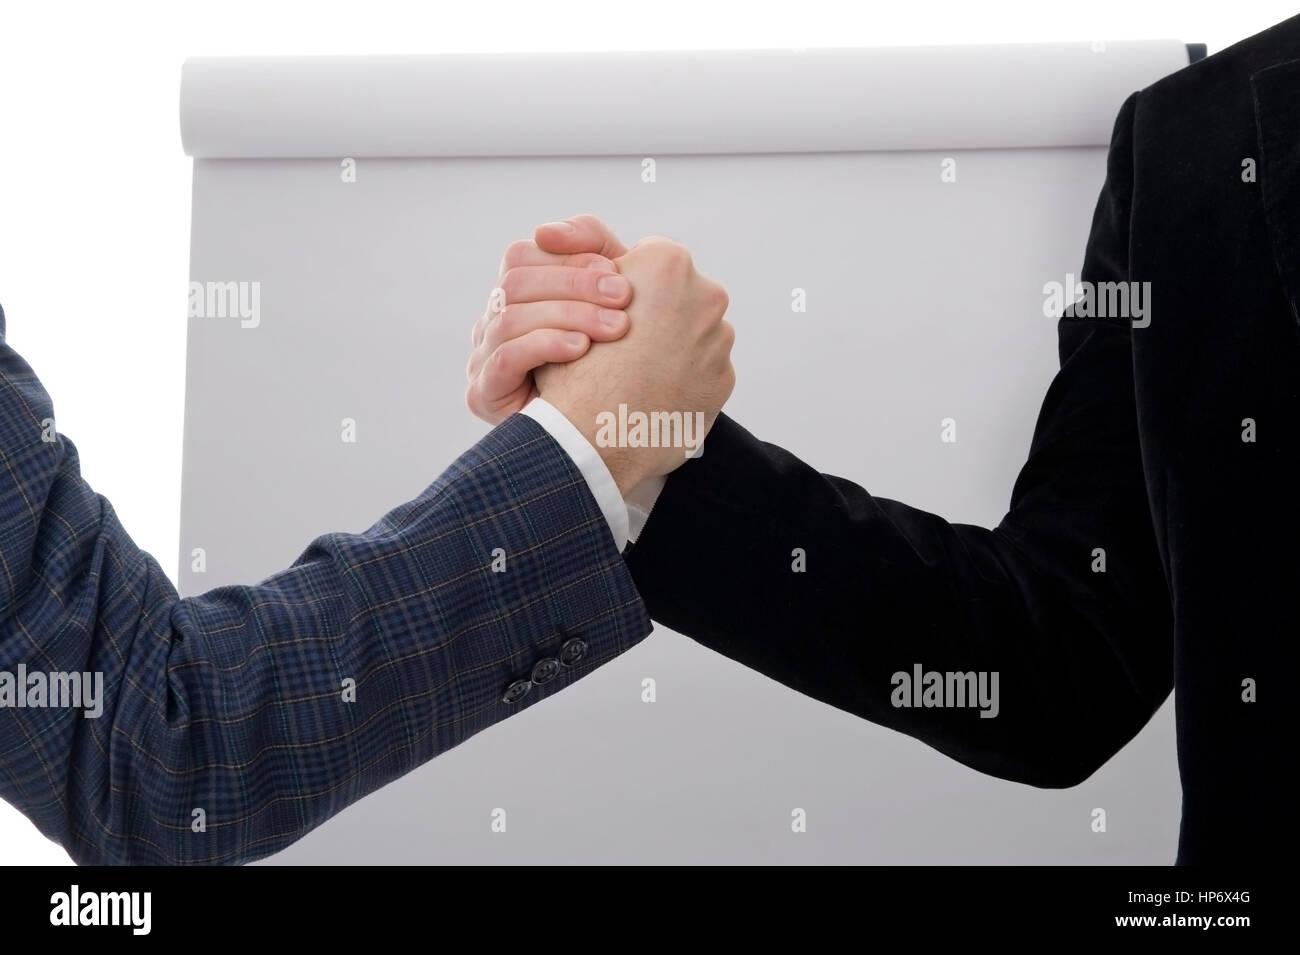 Geschaeftspartner - business partner - Stock Image